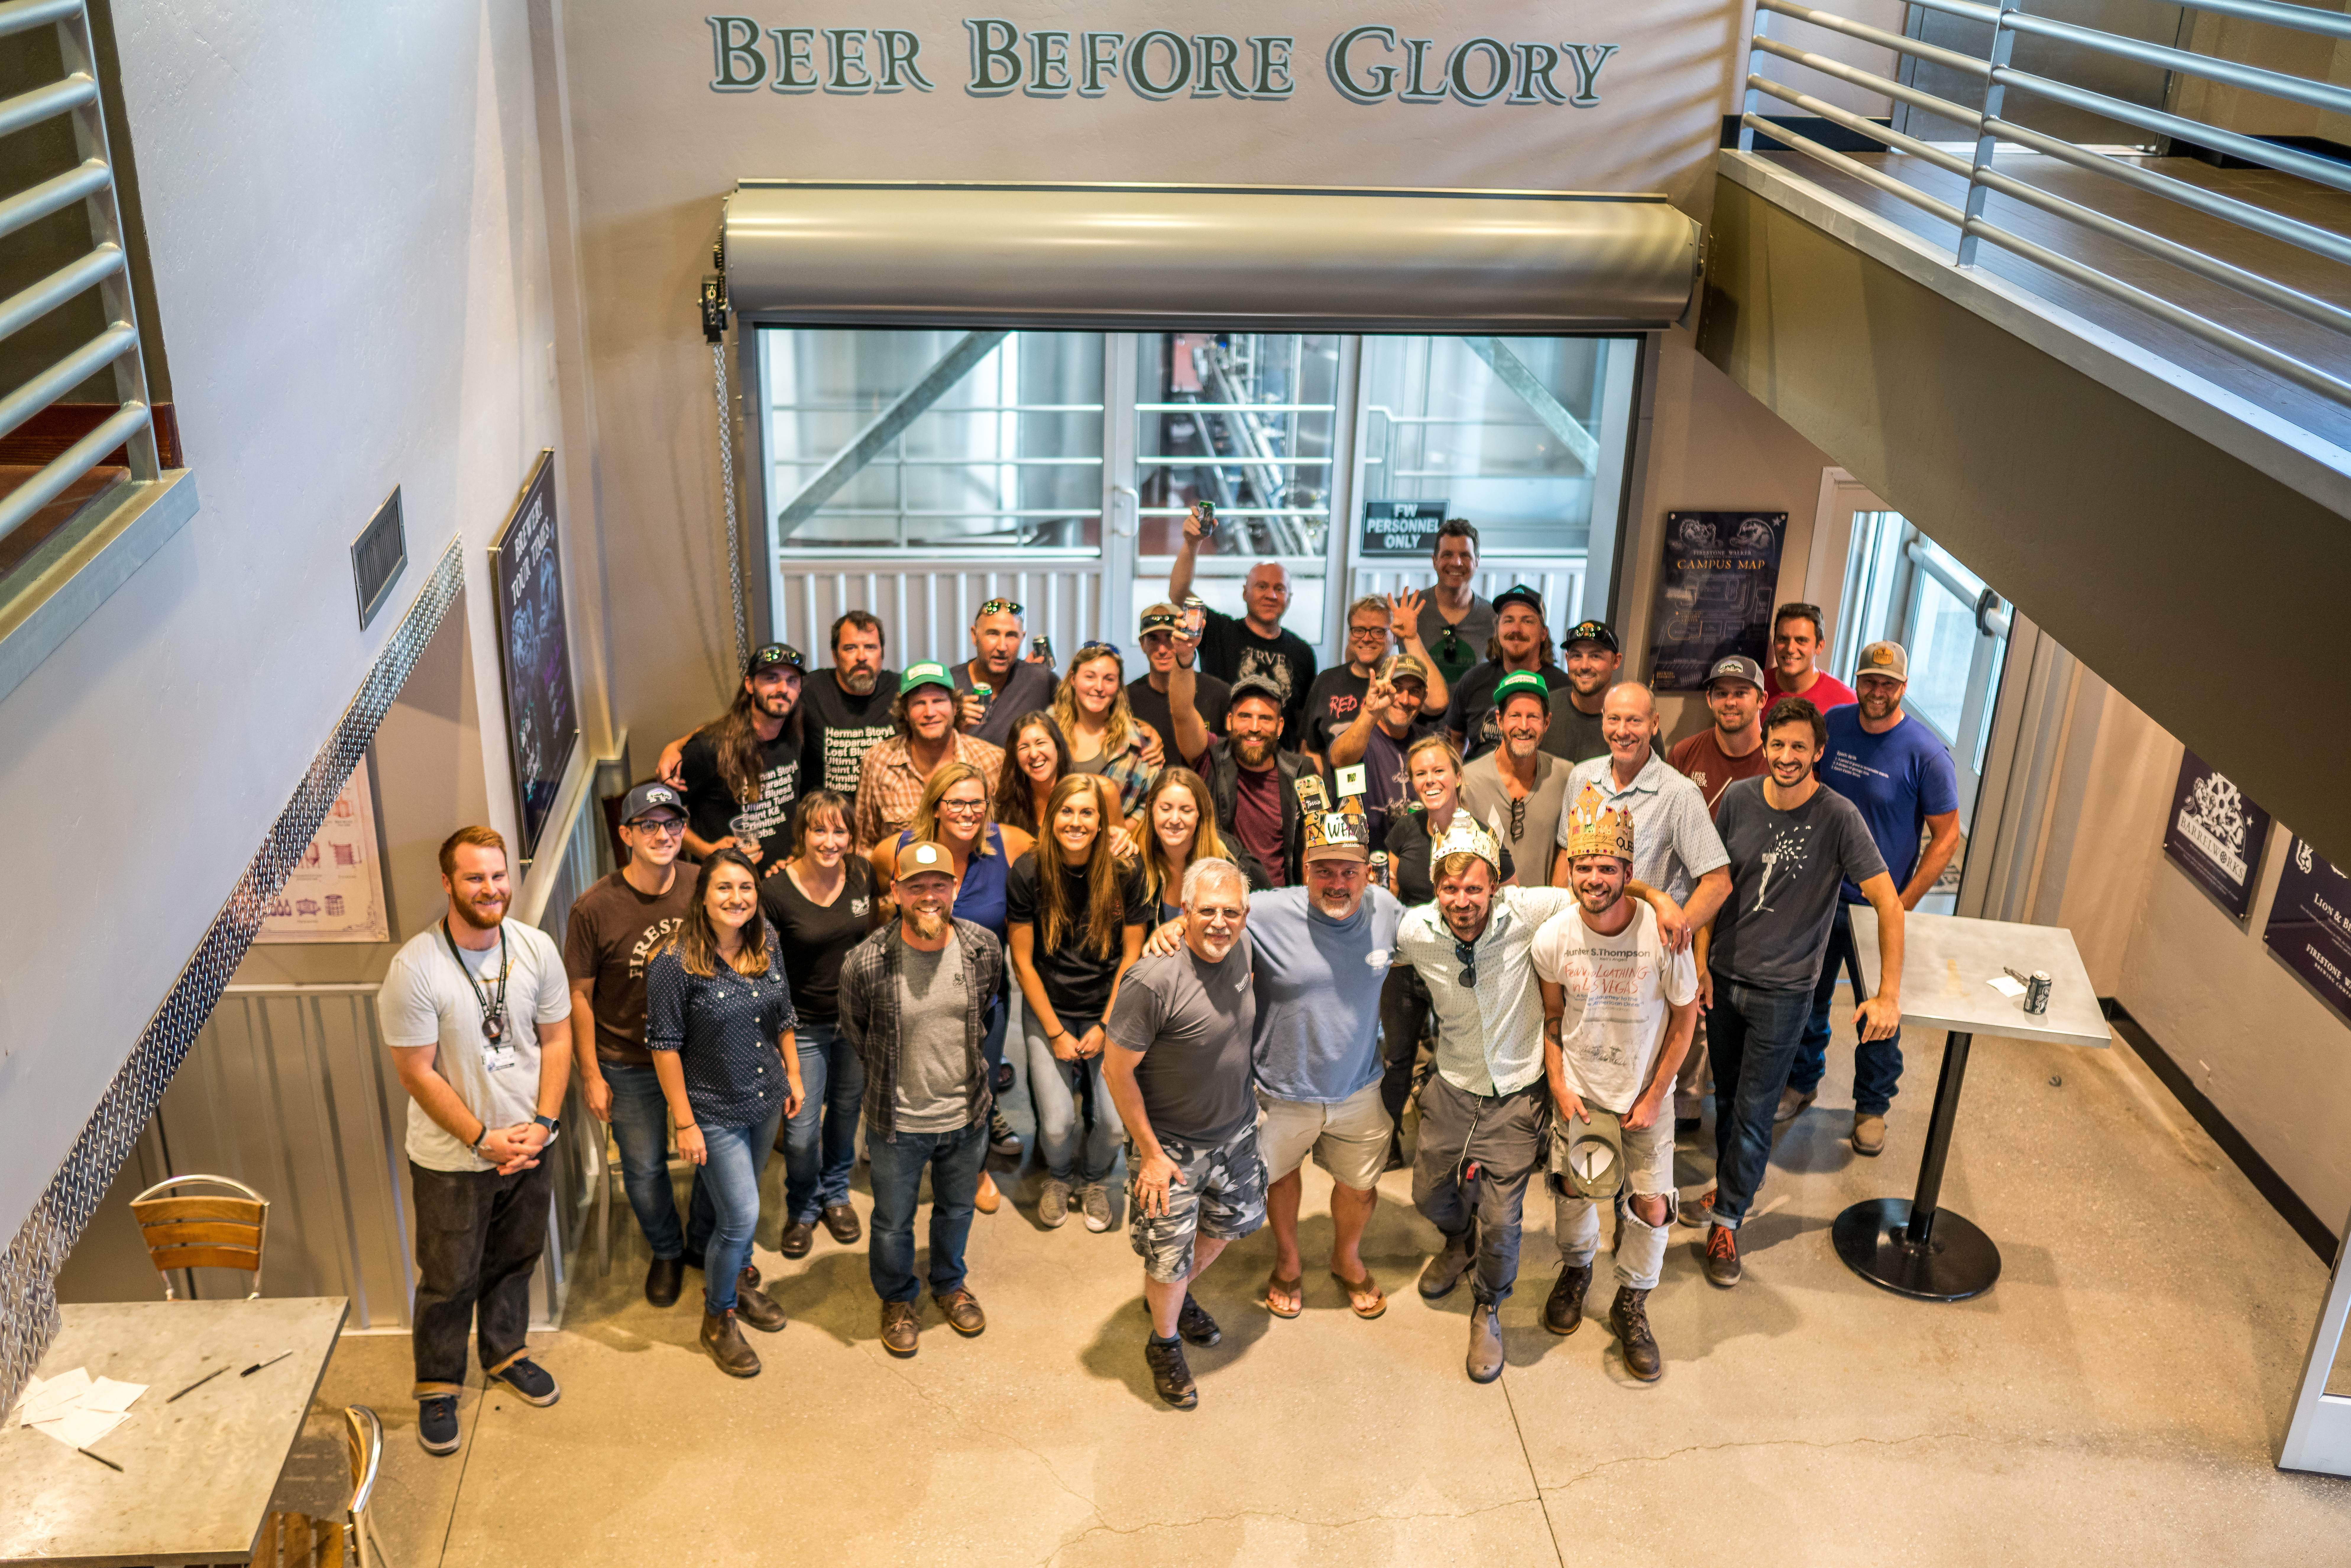 The Firestone Brewing XXII Anniversary Ale blending crew. (image courtesy of Firestone Walker Brewing)